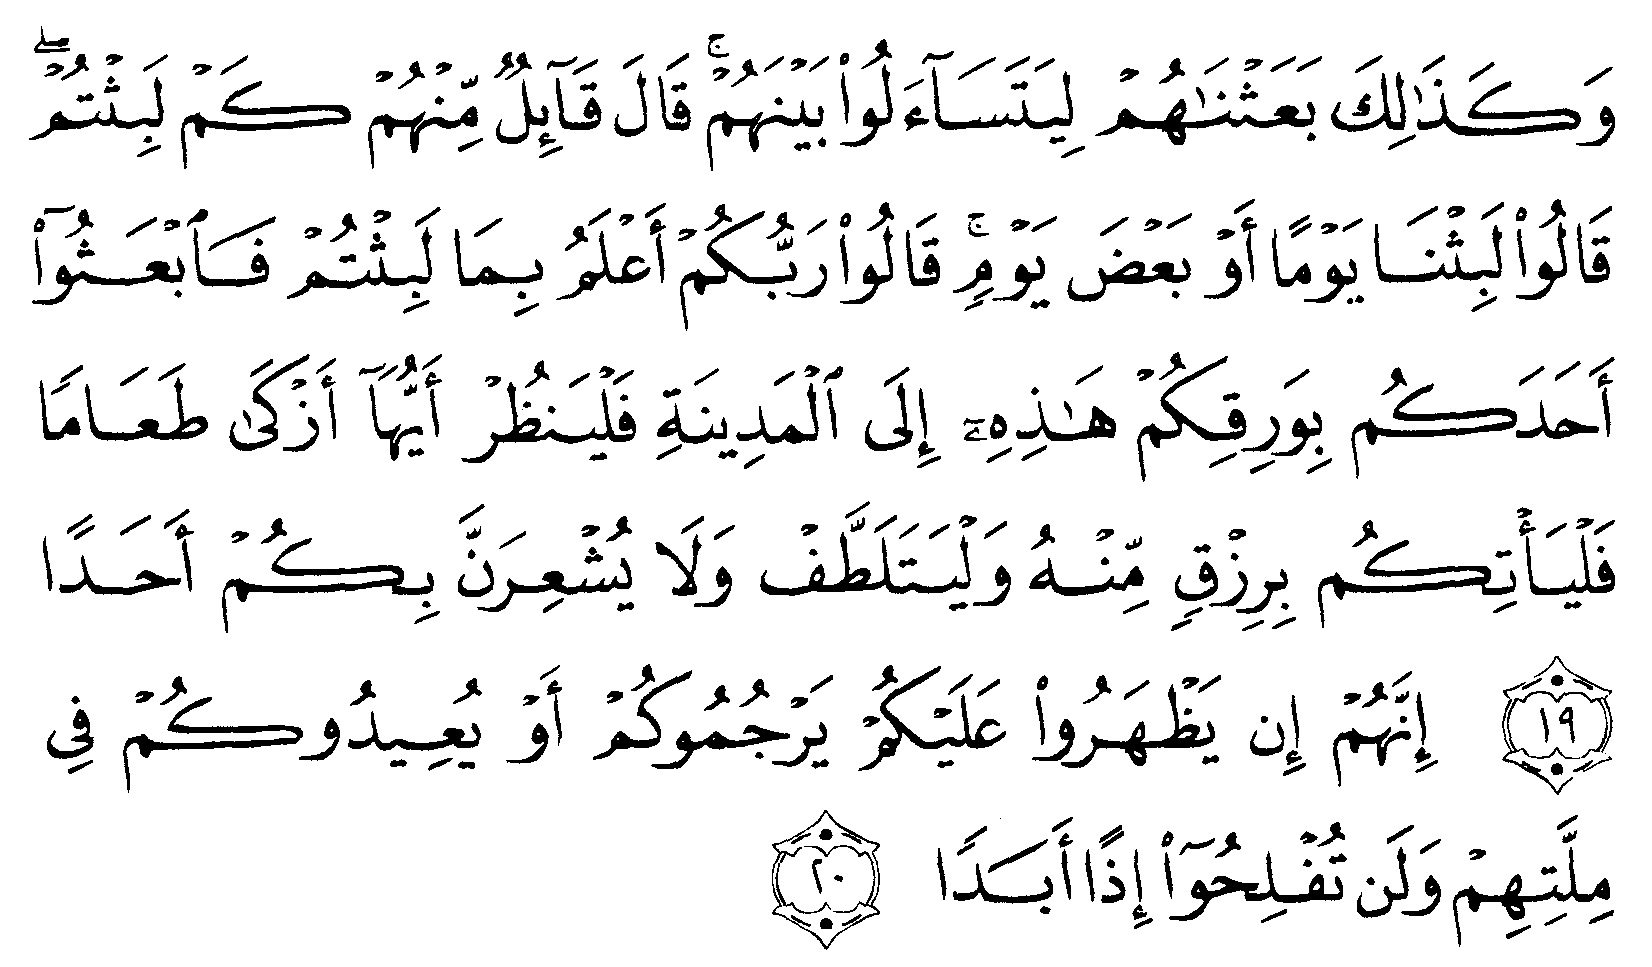 Tafsir Ibnu Katsir Surah Al Kahfi Ayat 19 20 Alquranmulia